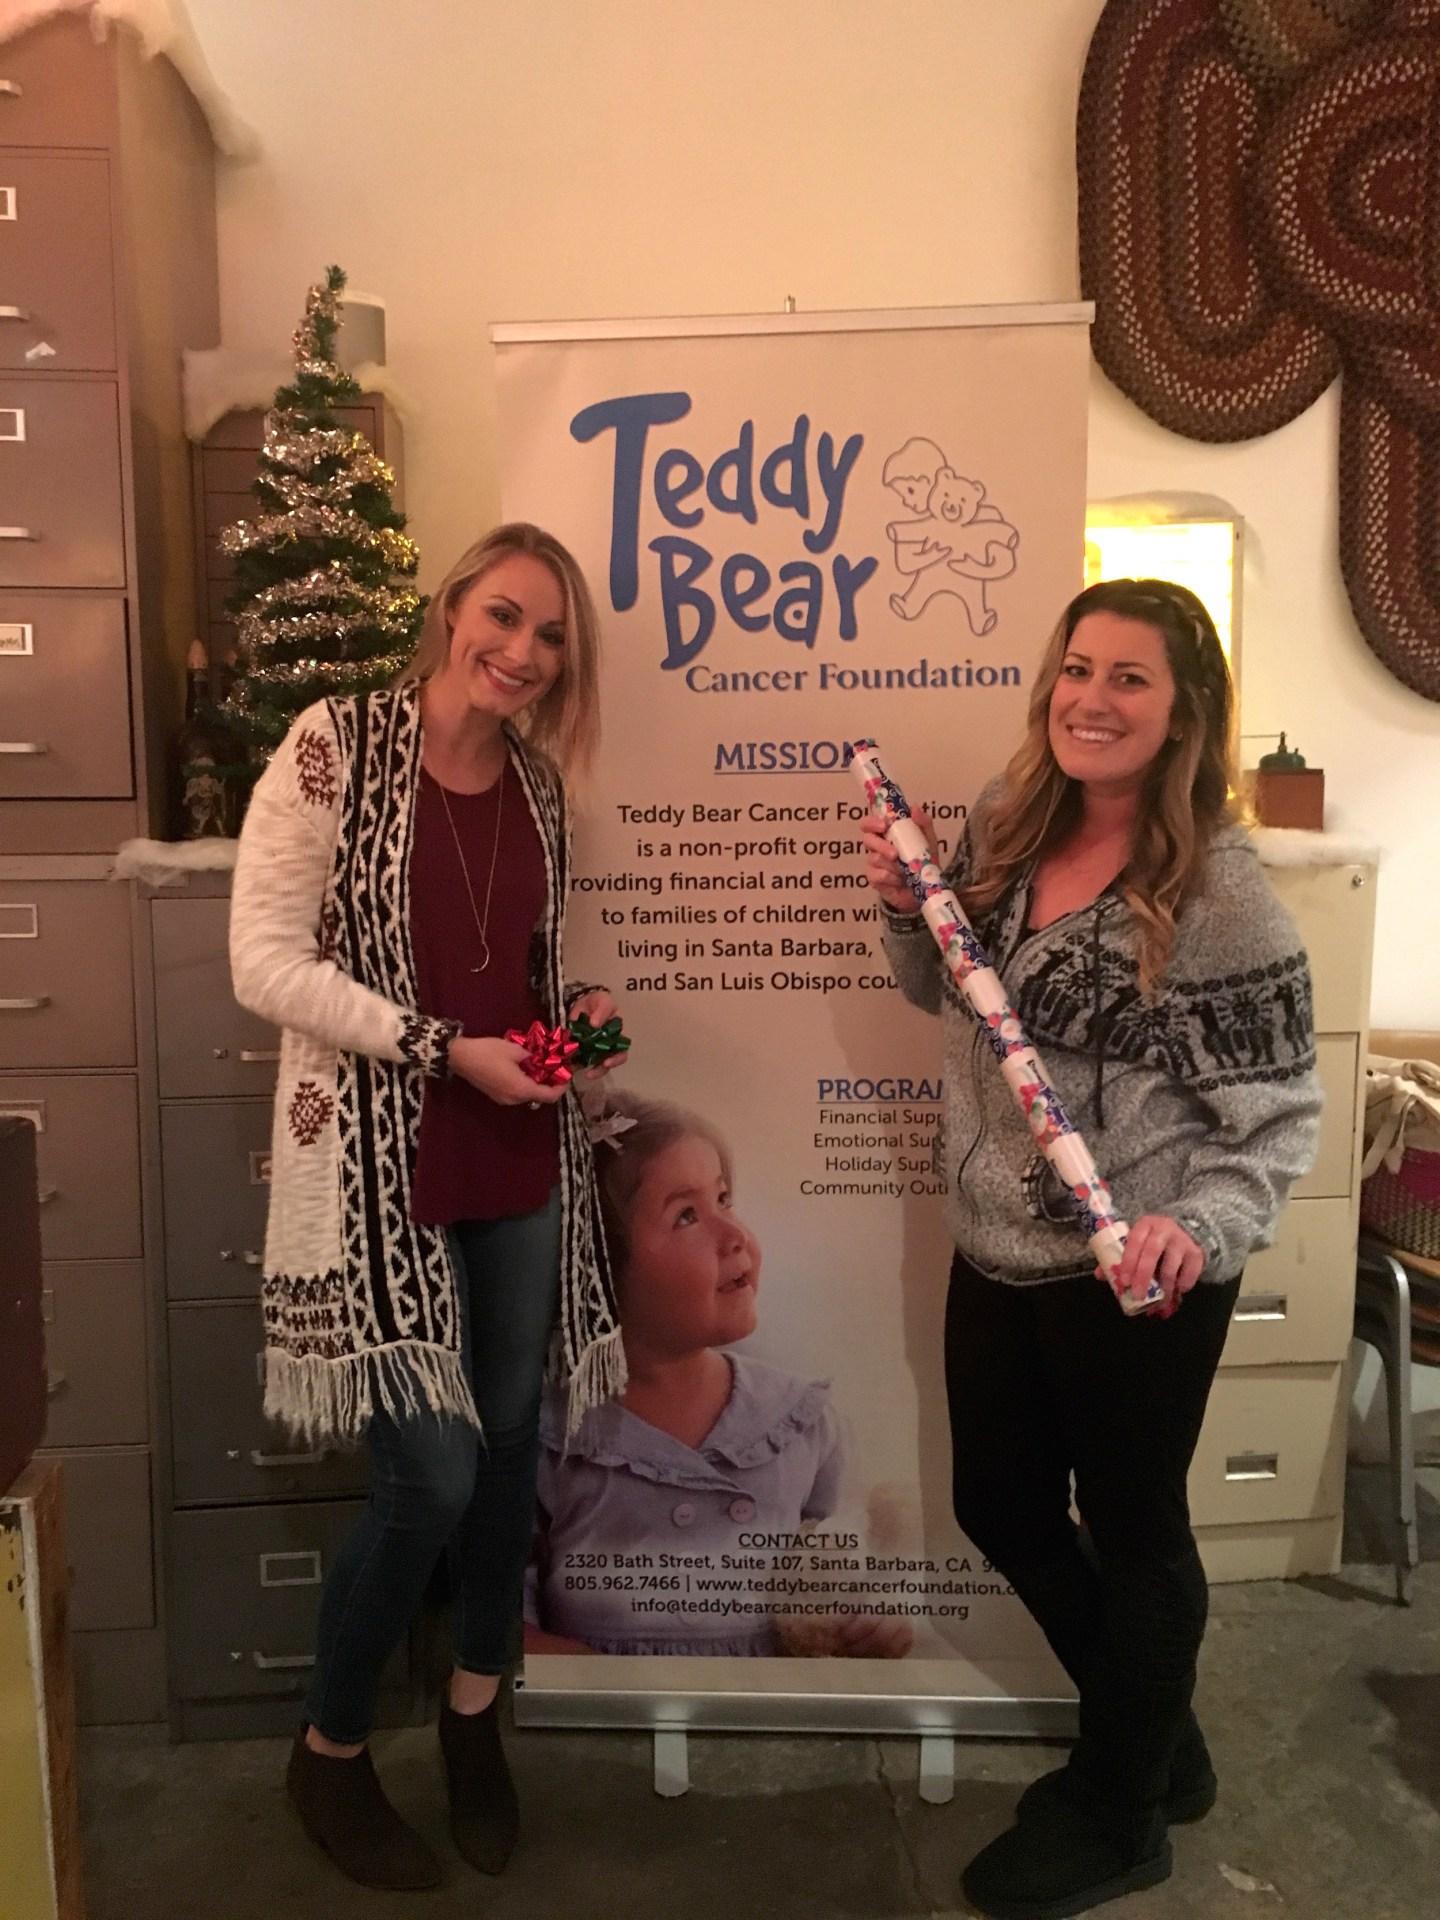 volunteer_teddy-bear-cancer-foundation